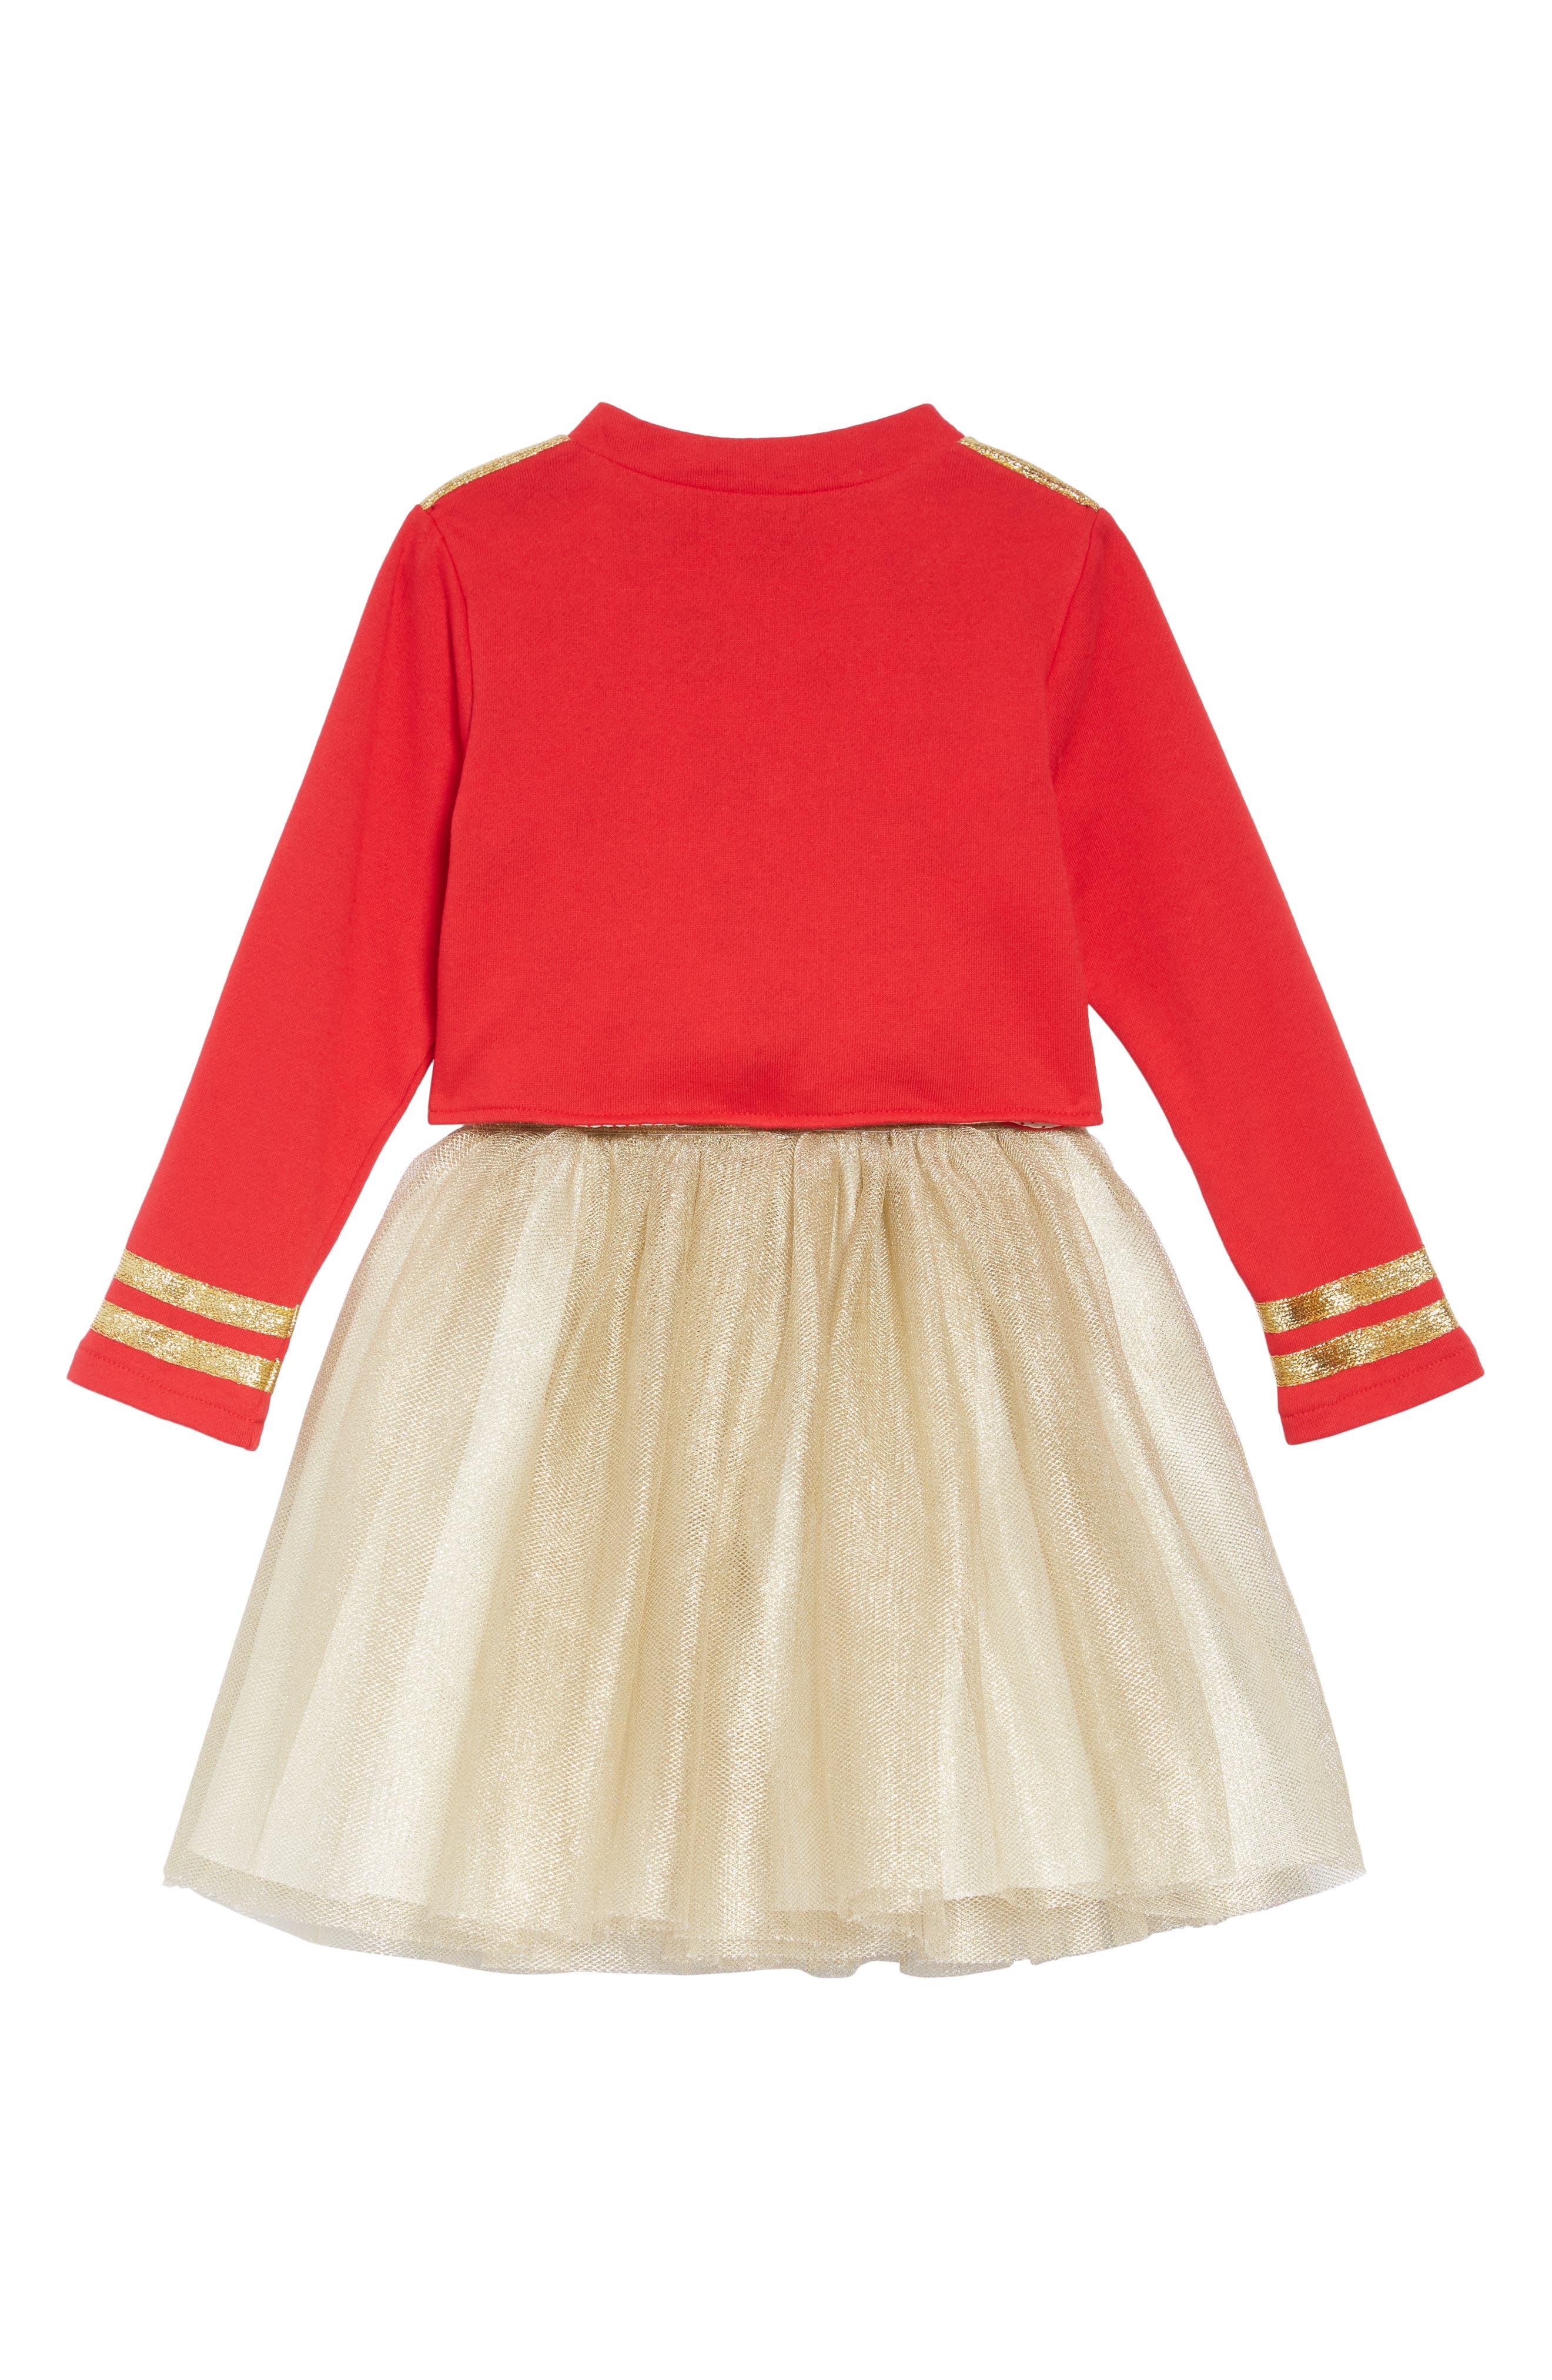 PIPPA & JULIE,                             x Disney<sup>®</sup> Mickey Mouse<sup>®</sup> Majorette Jacket & Tank Dress Set,                             Alternate thumbnail 2, color,                             643